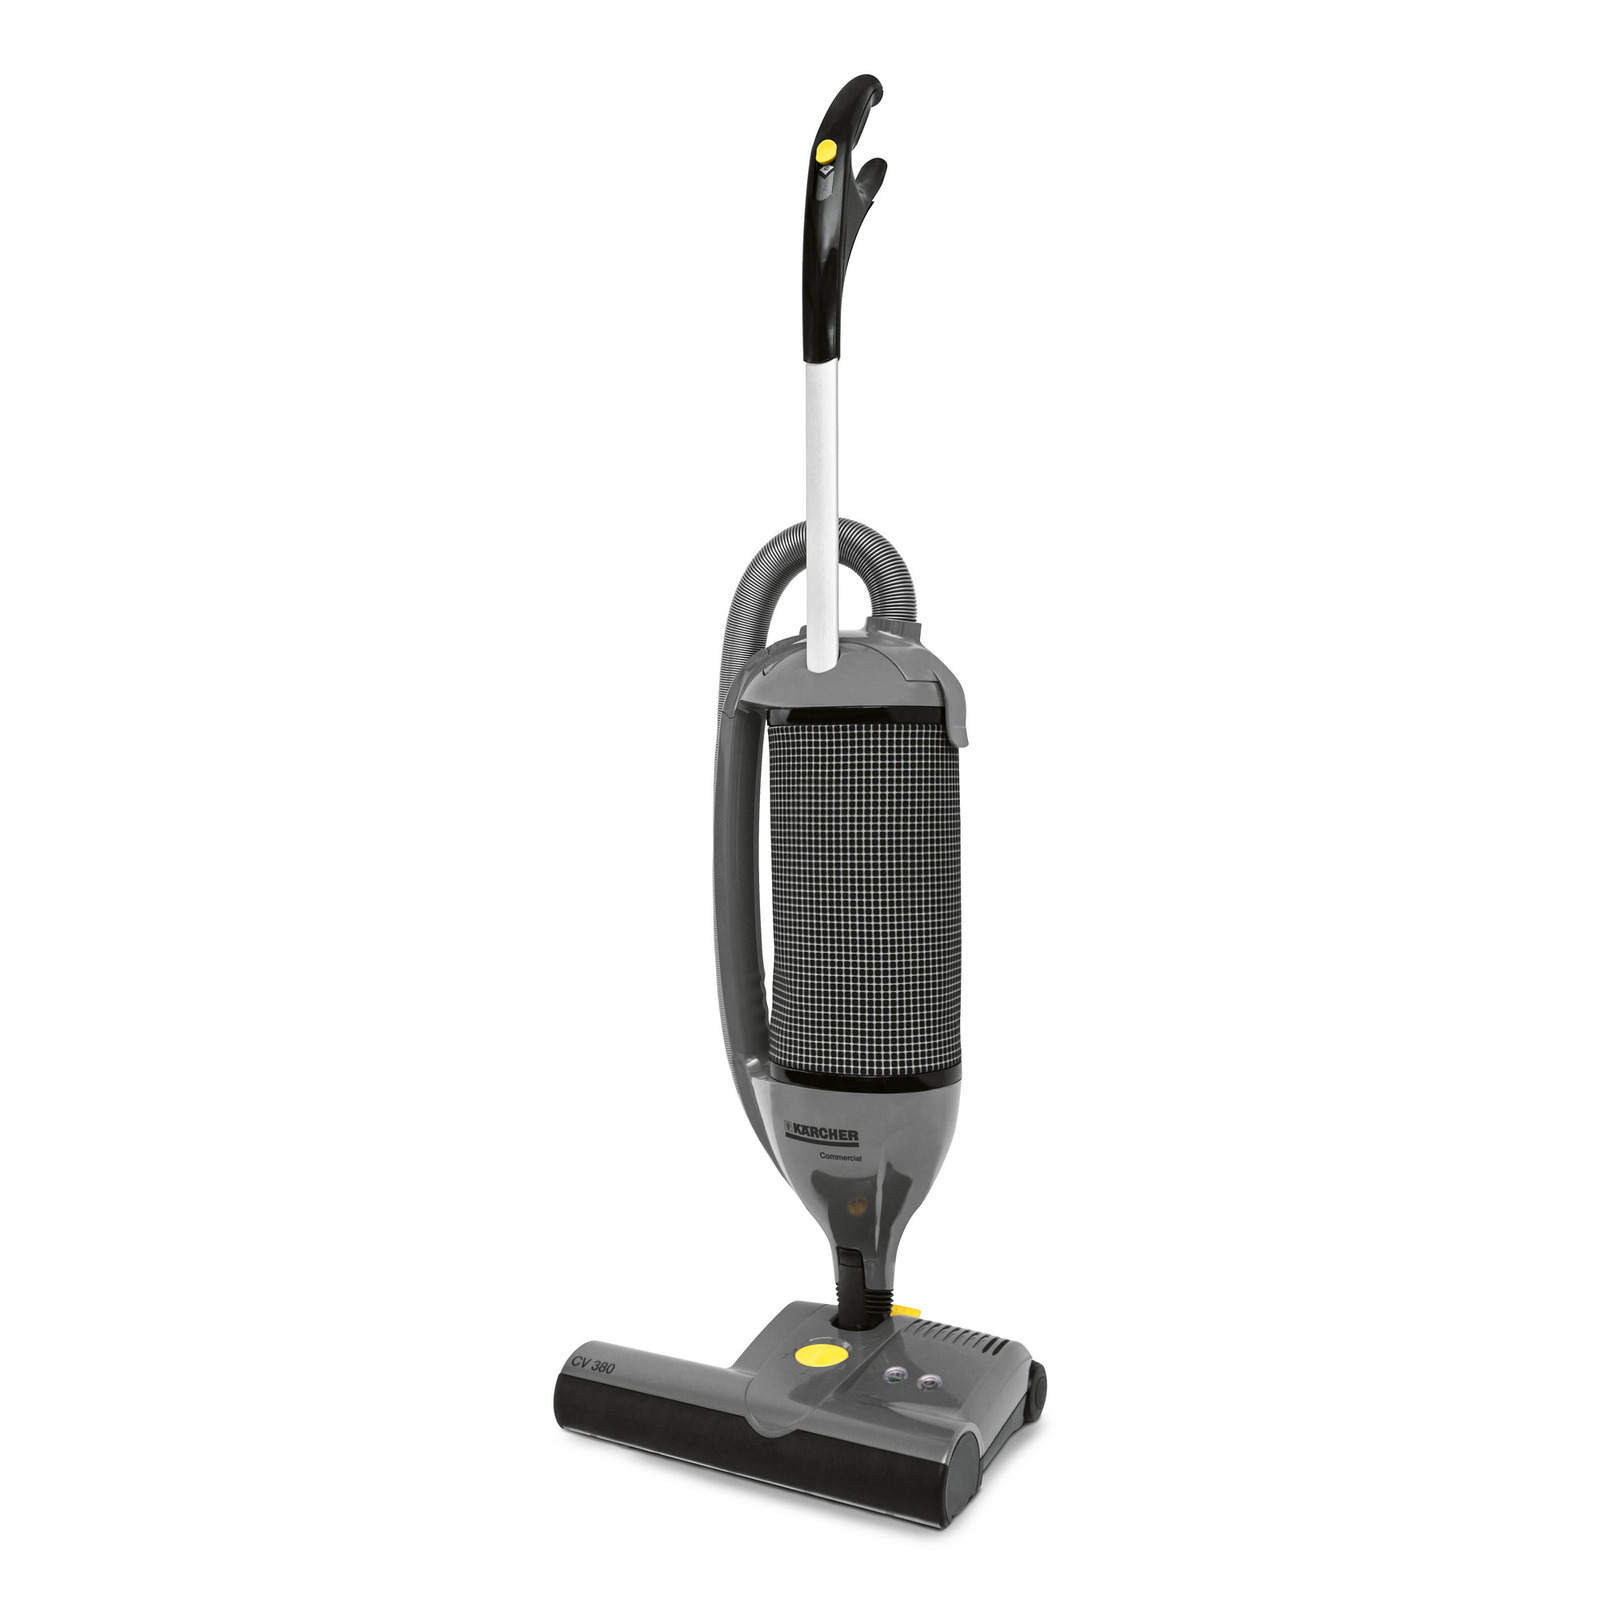 CV 380 10120600 https://www.kaercher.com/us/professional/commercial-vacuums/ upright-commercial-vacuums/cv-380-10120600.html Kärcher's CV dual-motor  upright ...